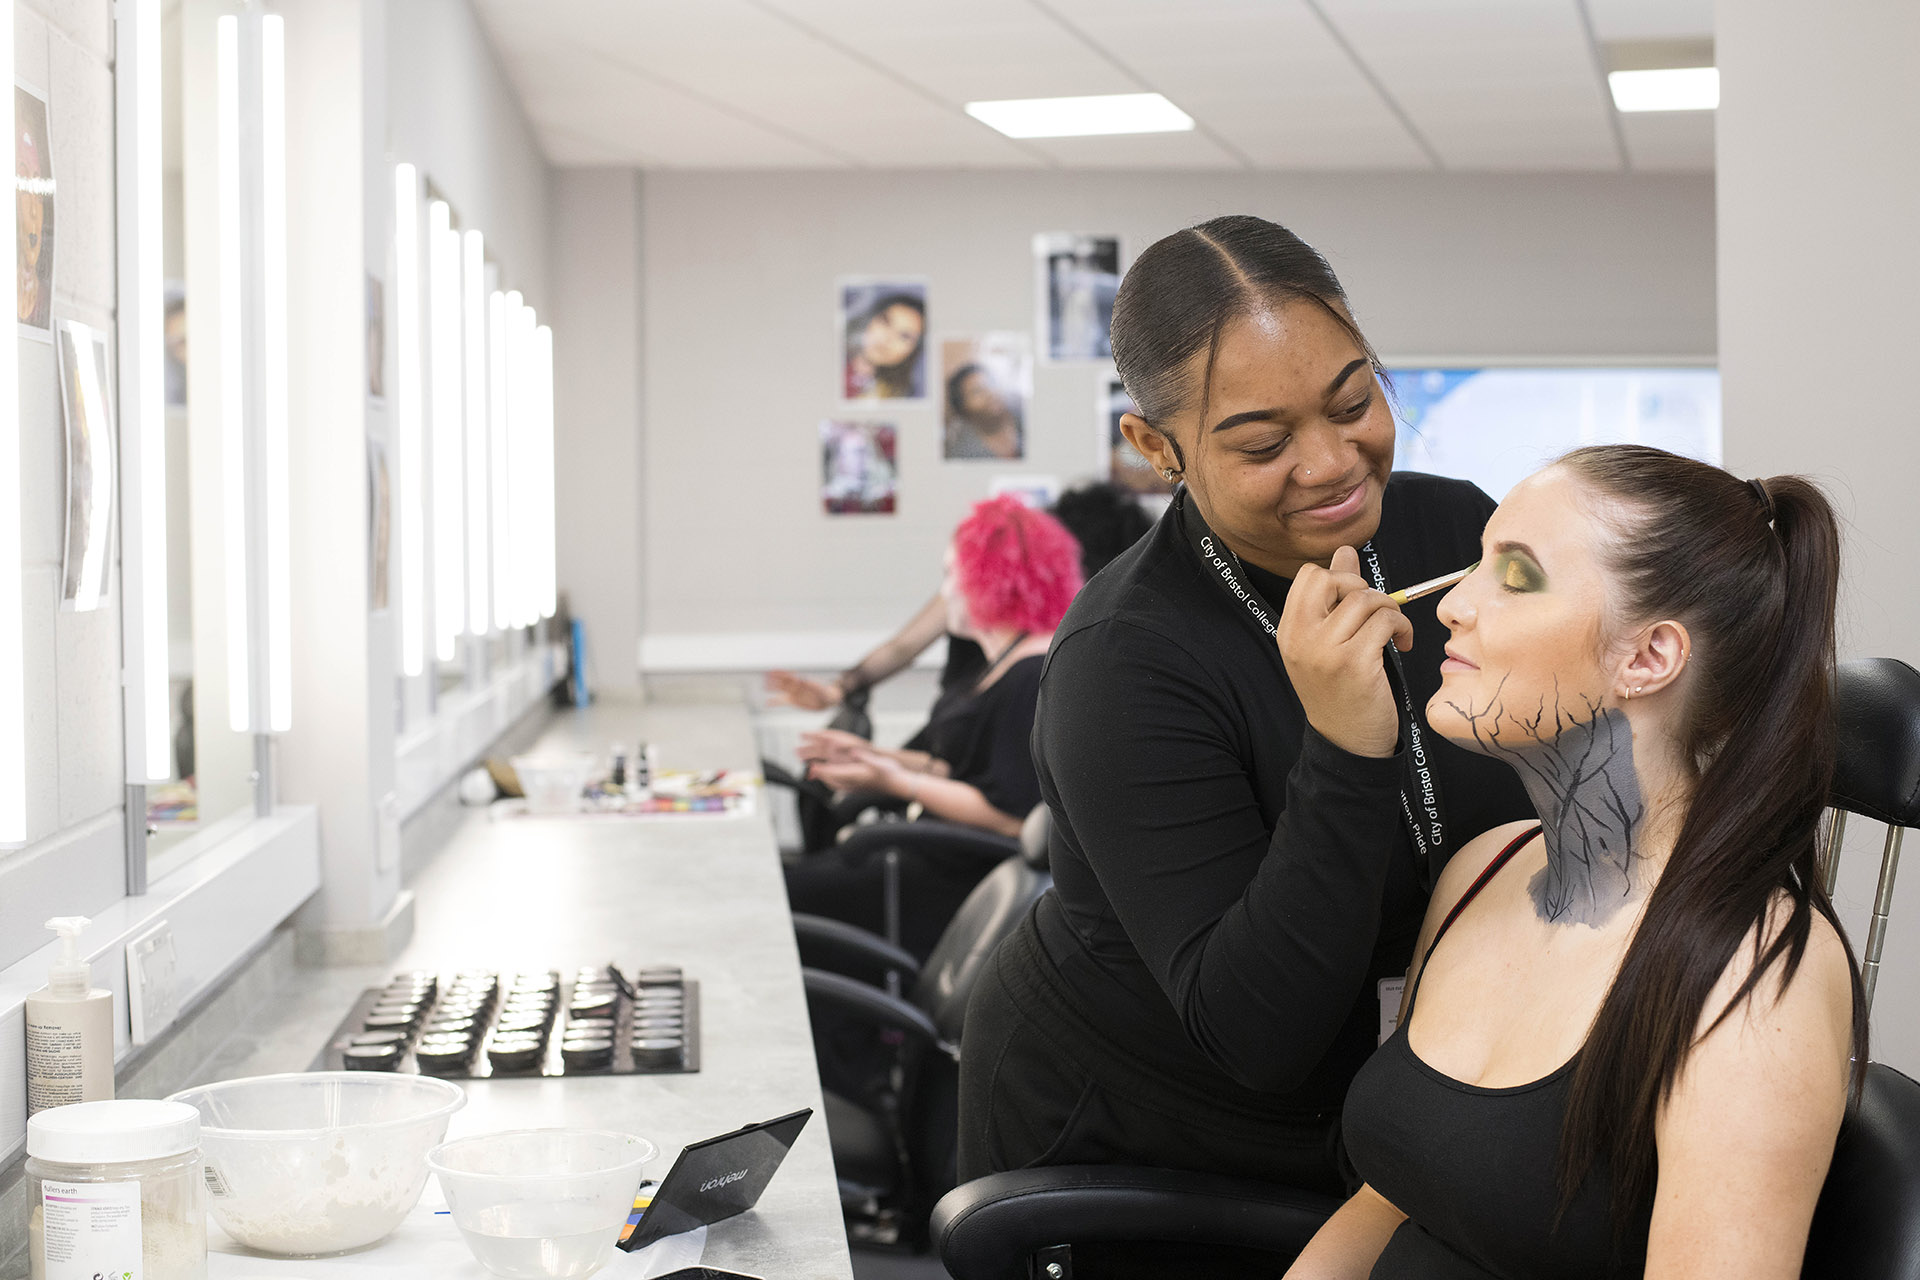 Media Make-Up Students